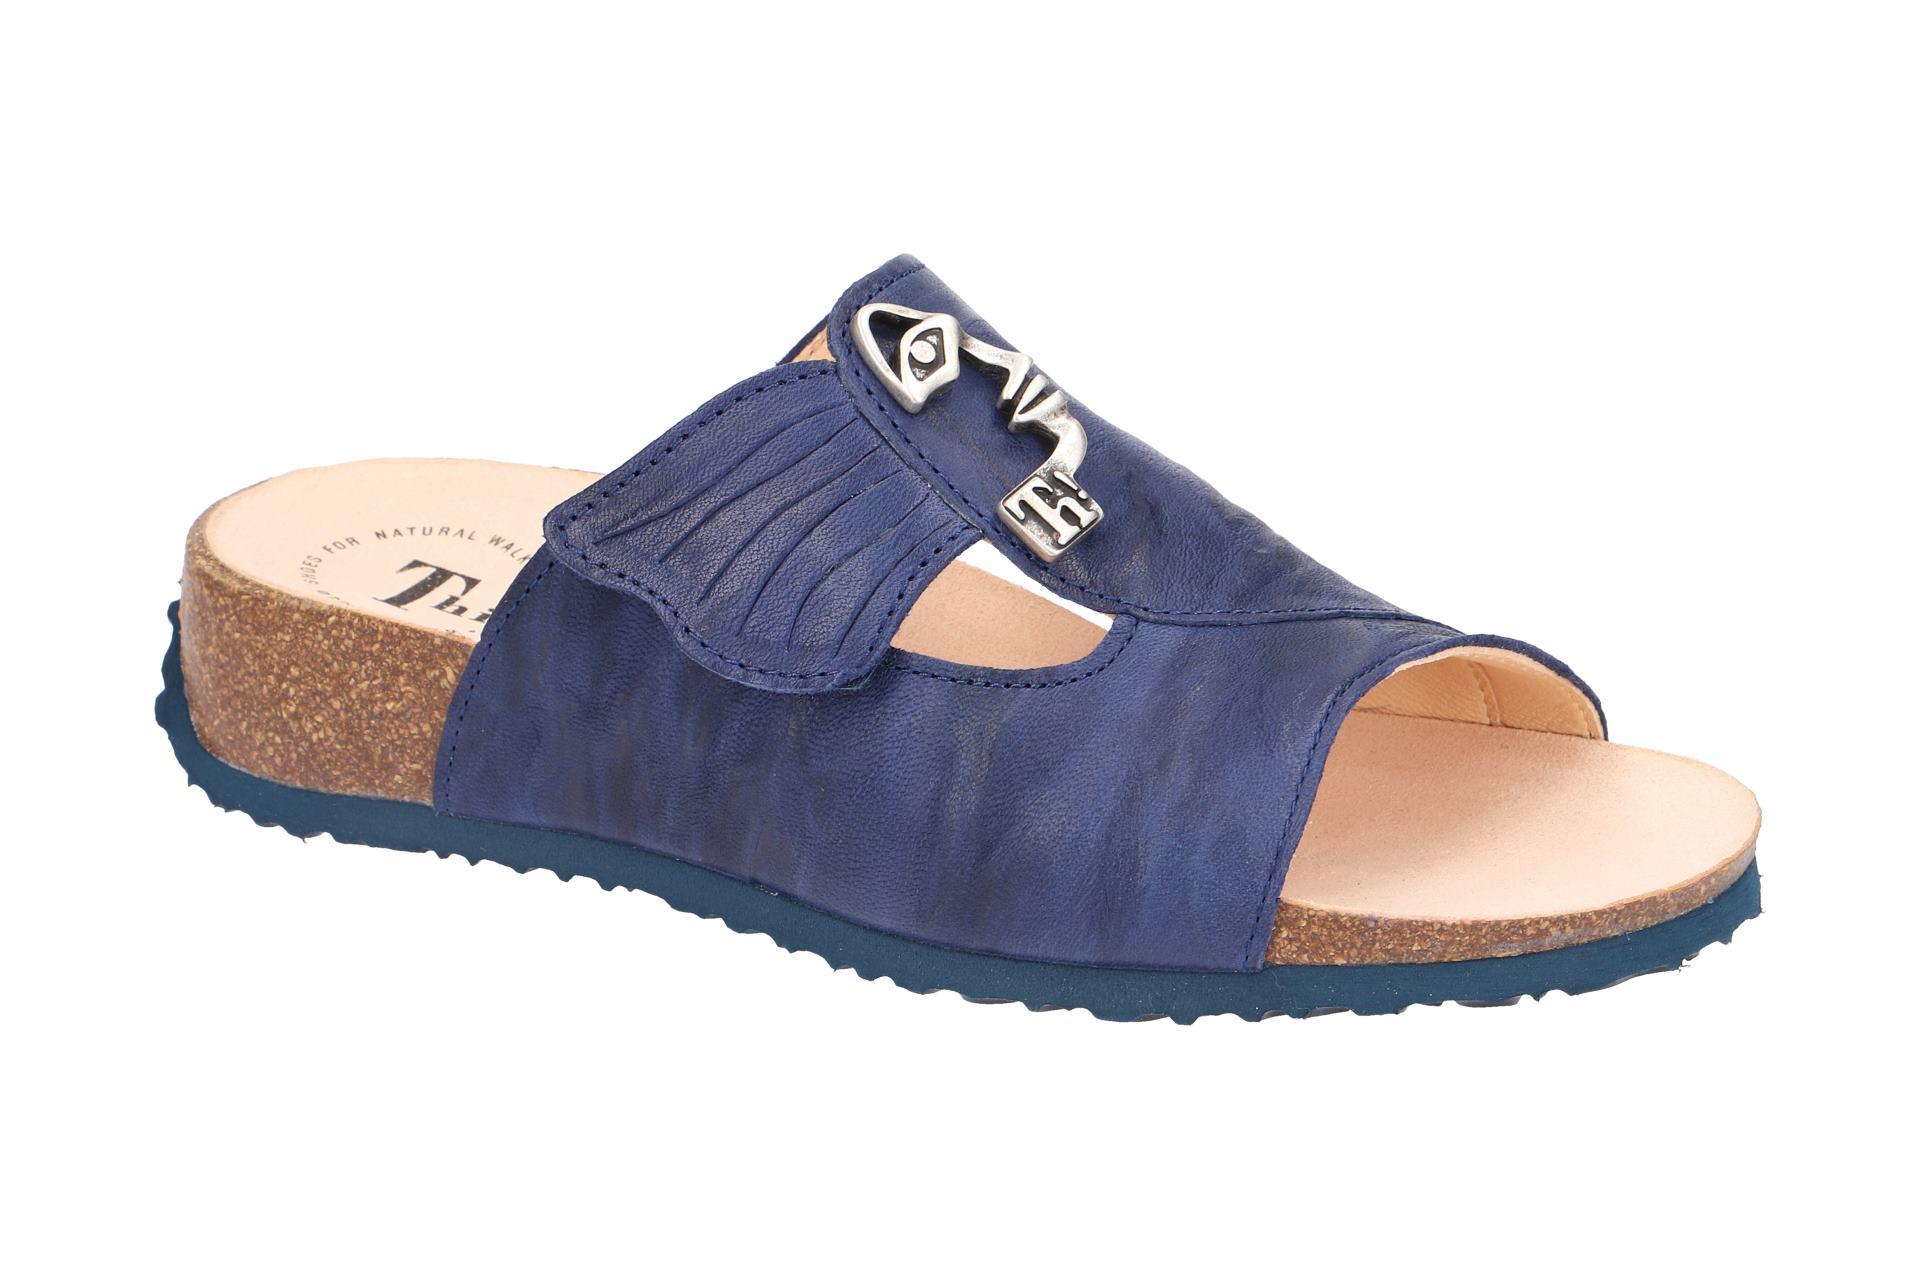 Gabor 03.705 Damenschuhe bequeme Pantoletten blau NEU